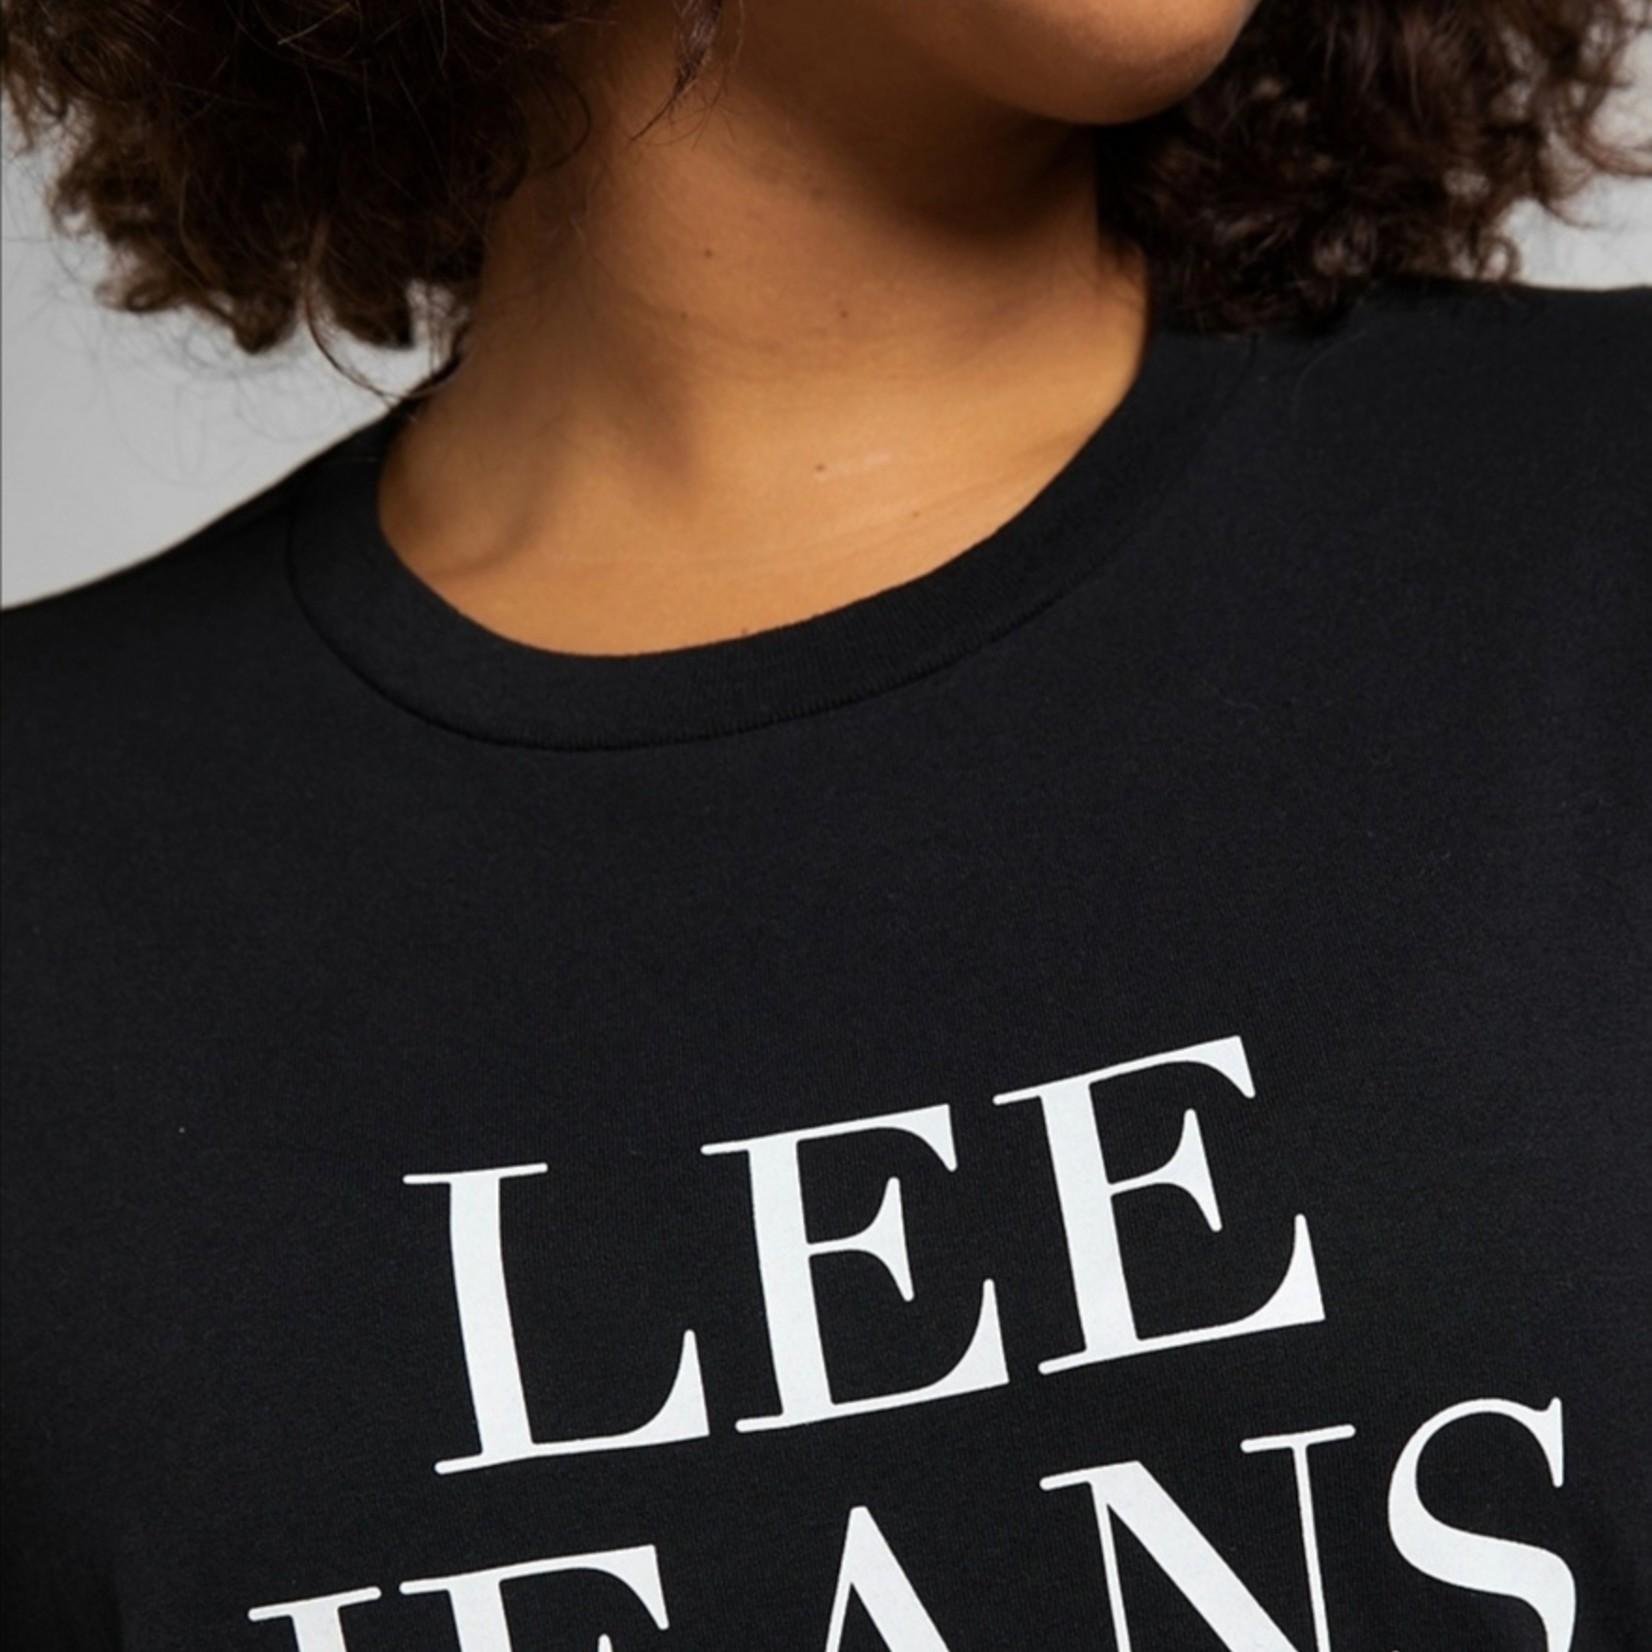 LEE GRAPHIC TEE, regular fit